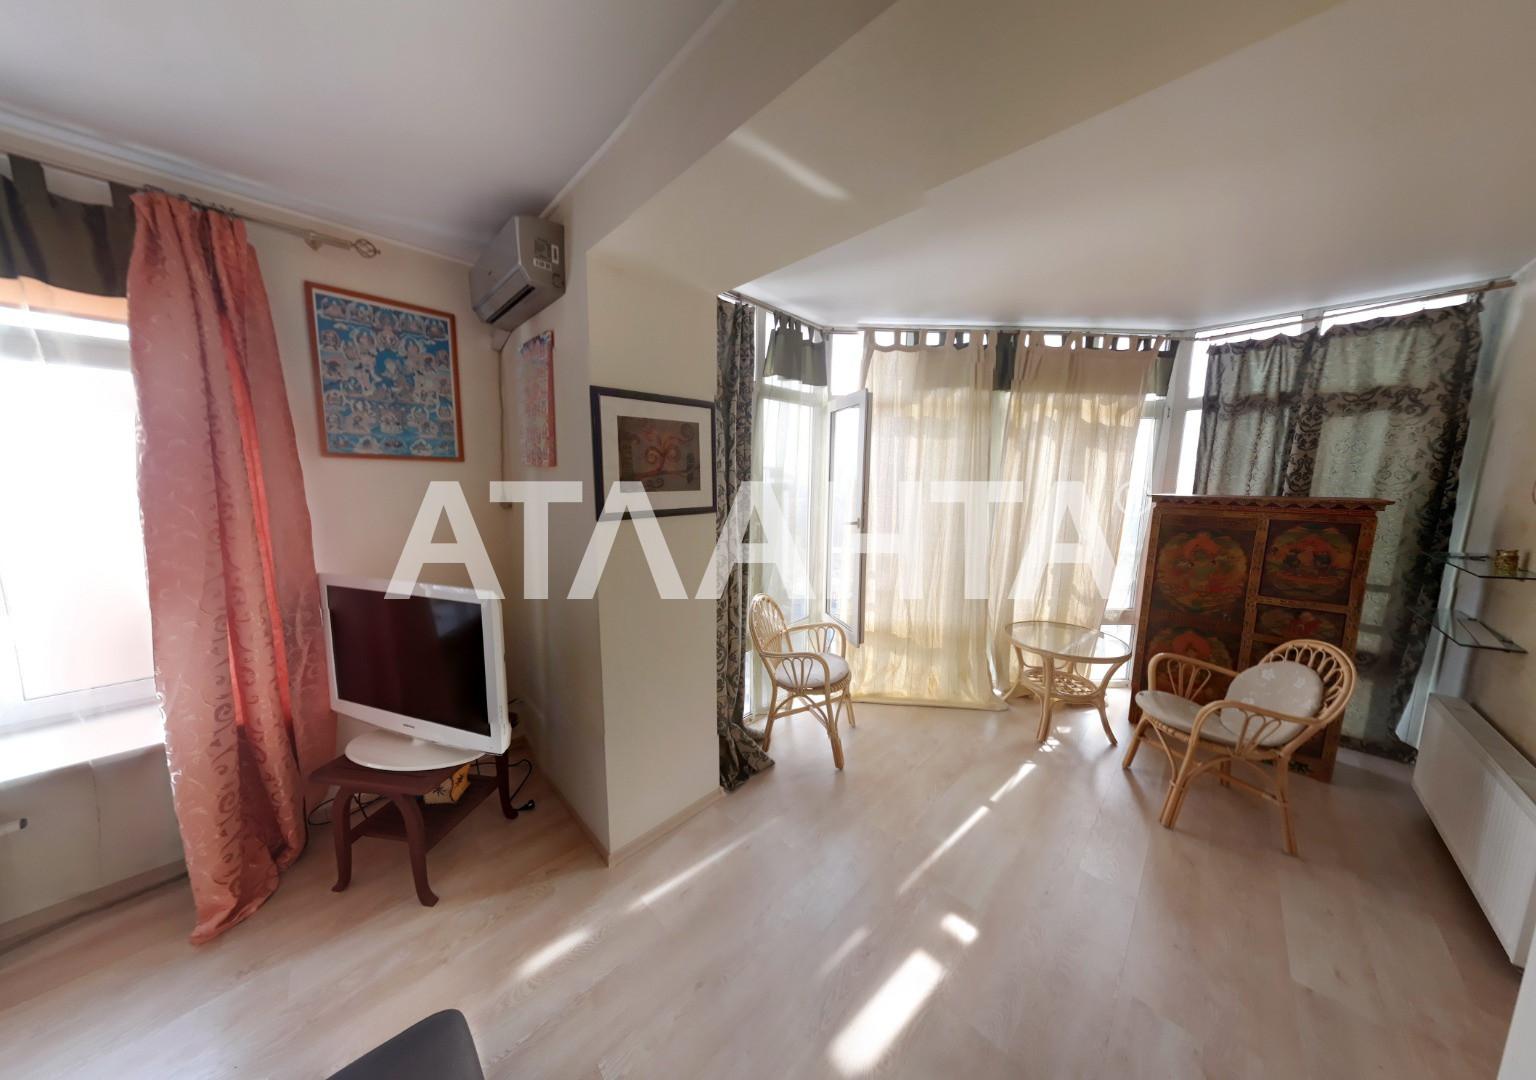 Продается 3-комнатная Квартира на ул. Ломоносова — 118 900 у.е. (фото №22)